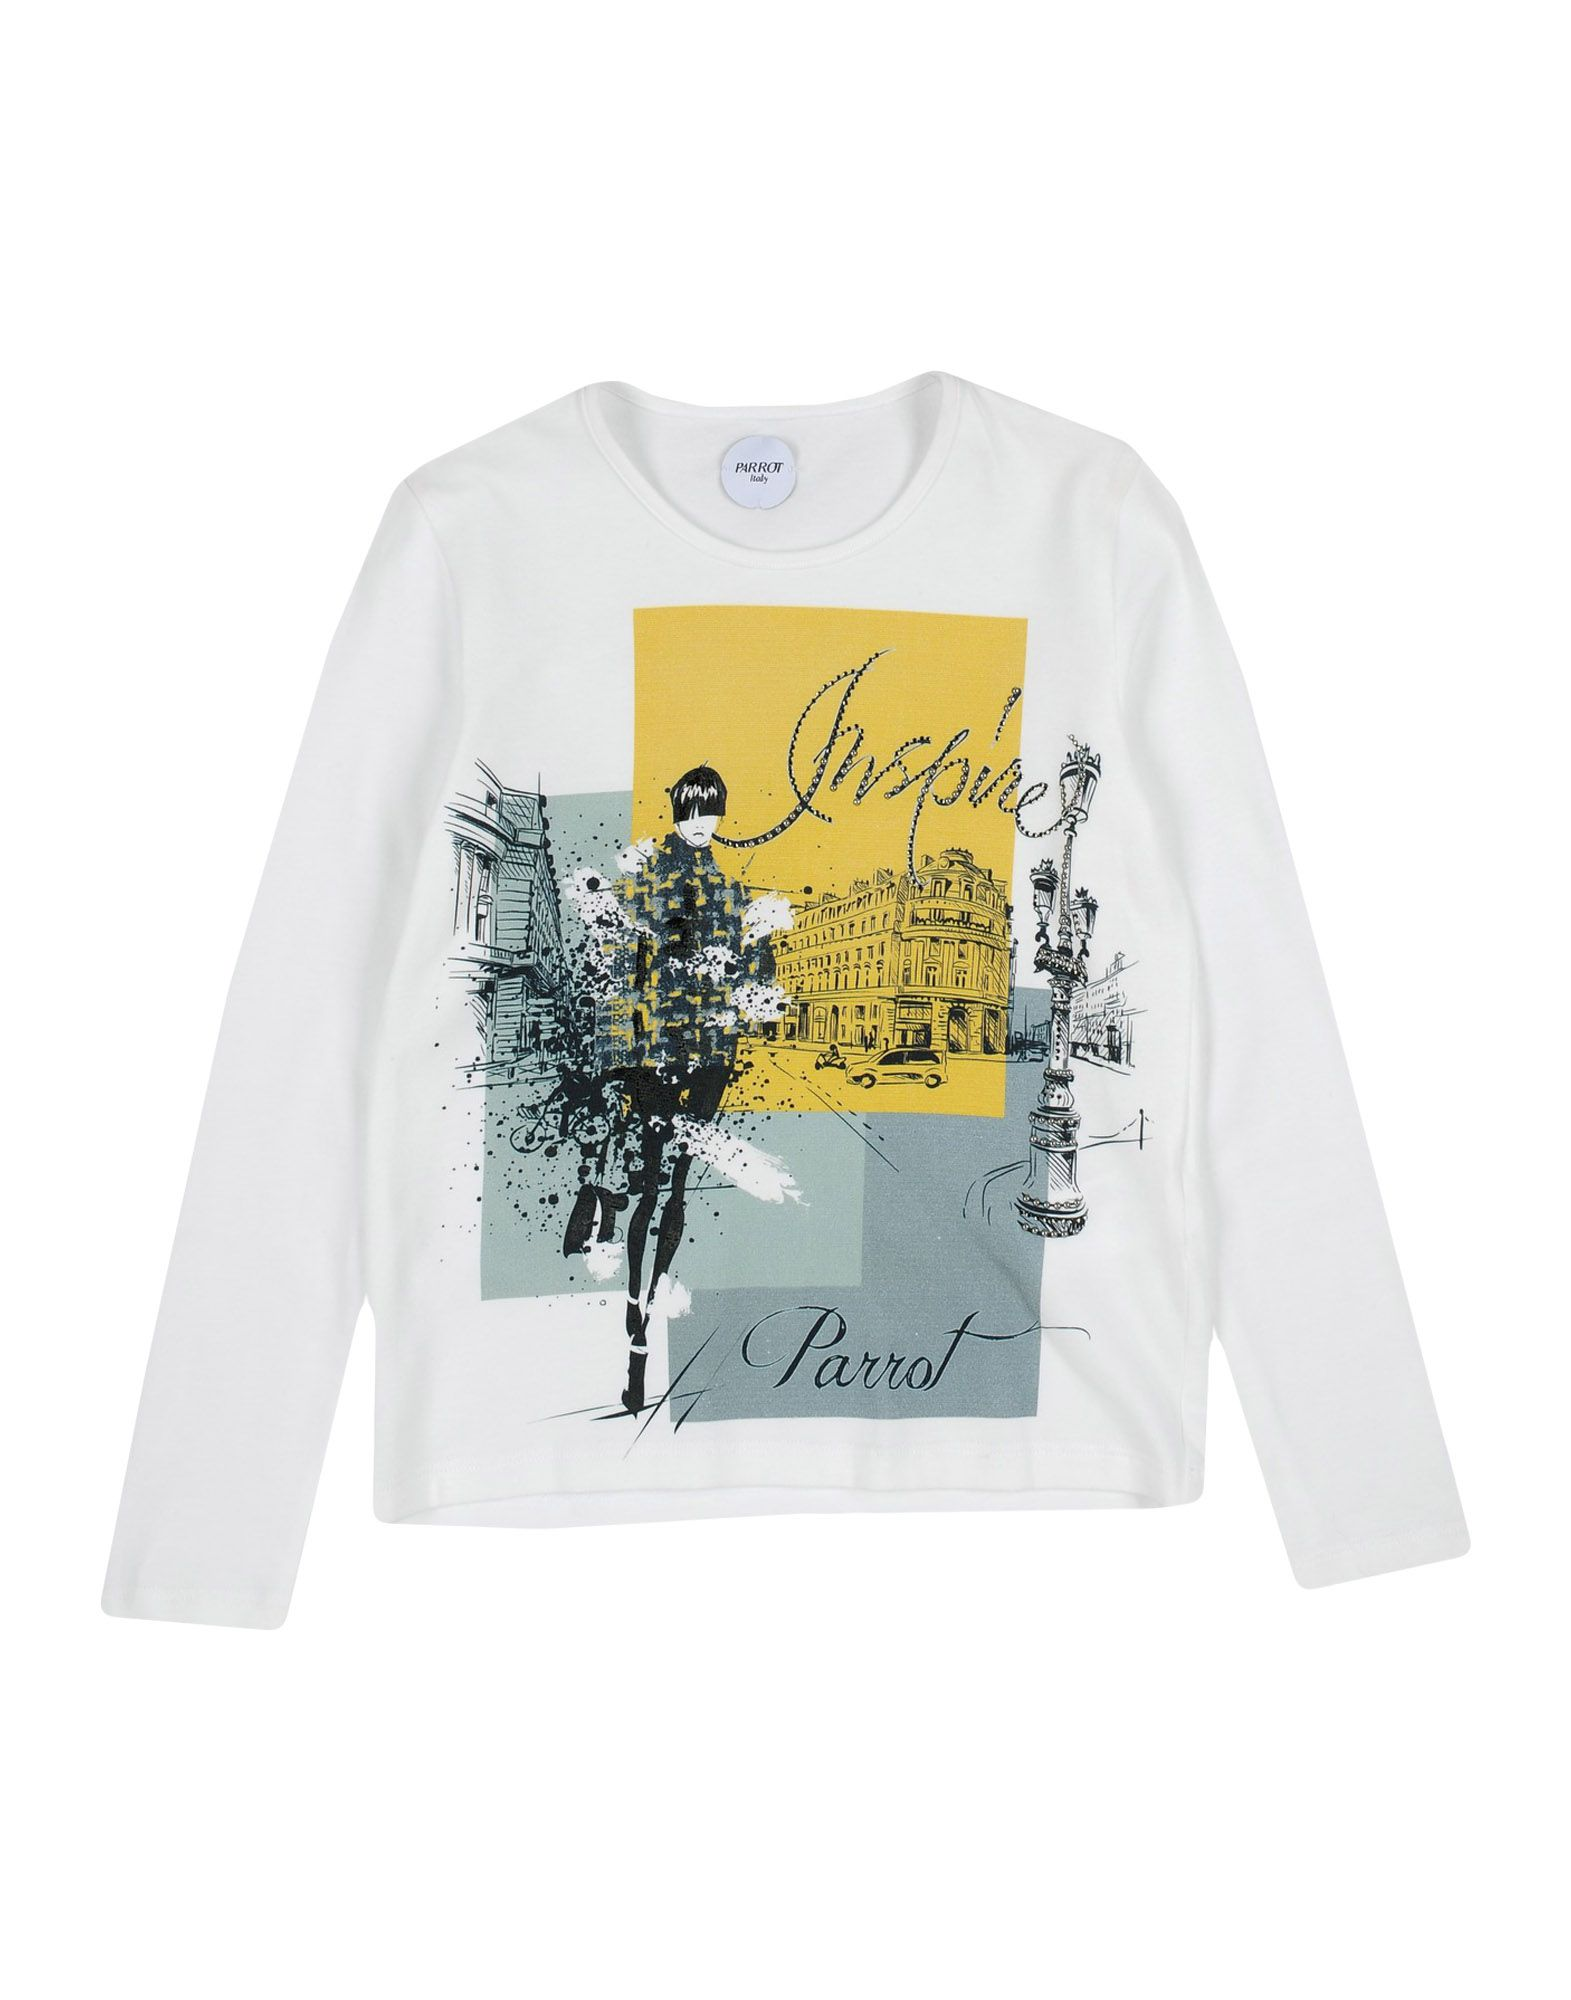 PARROT T-Shirt in White